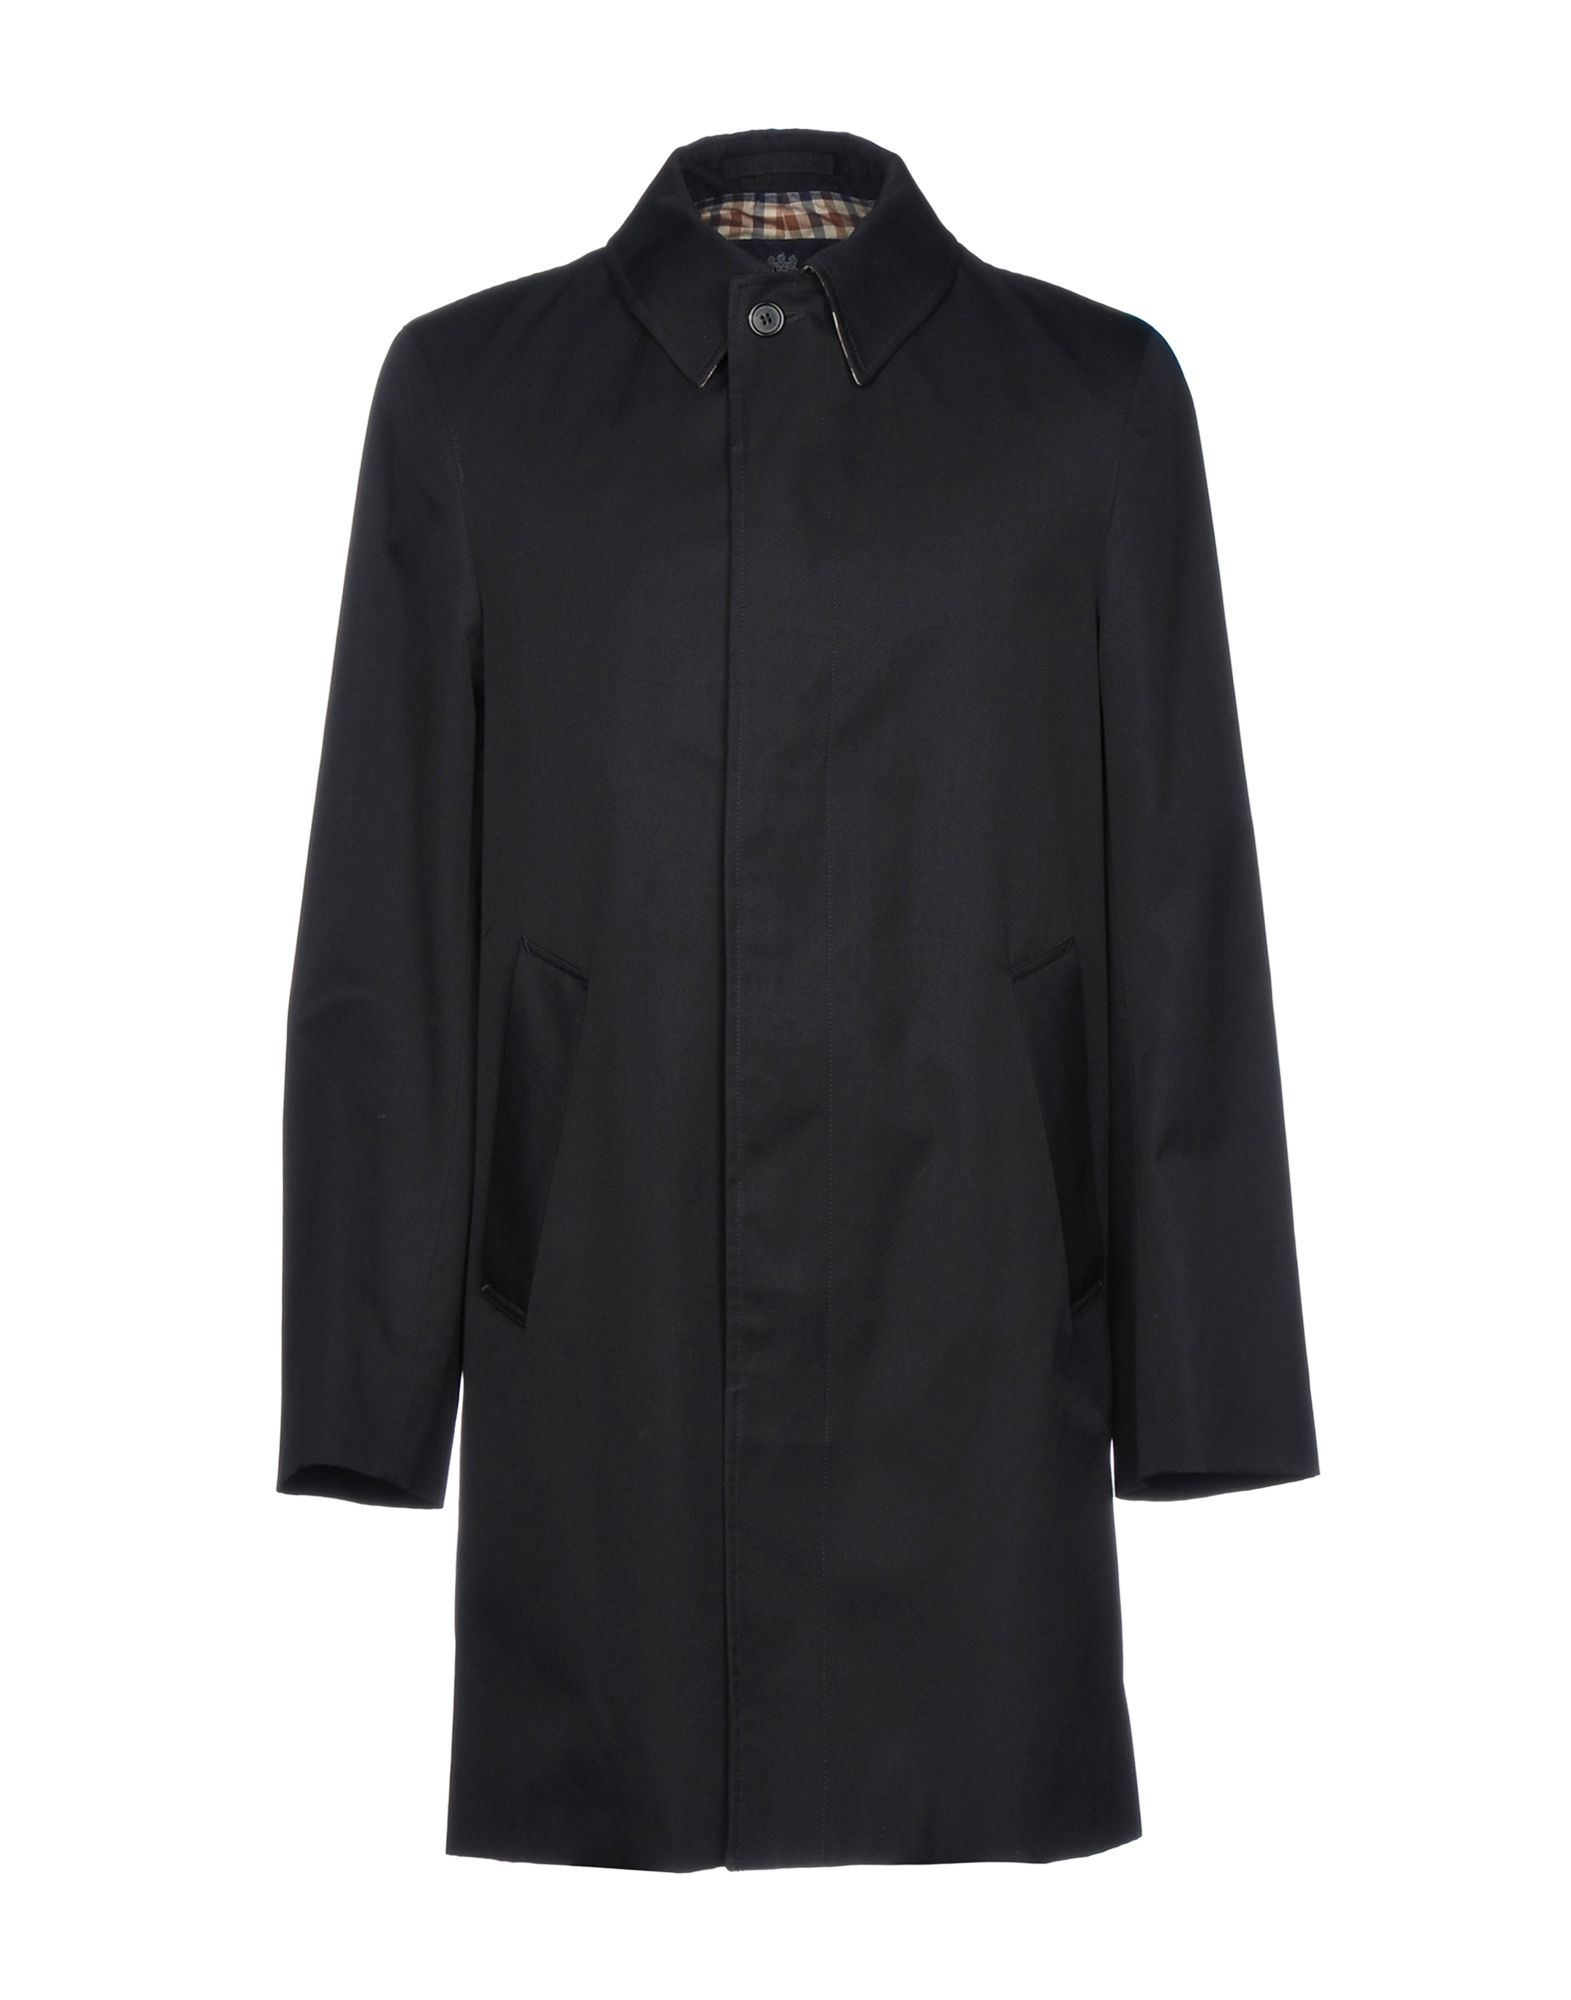 AQUASCUTUM Full-Length Jacket in Dark Blue